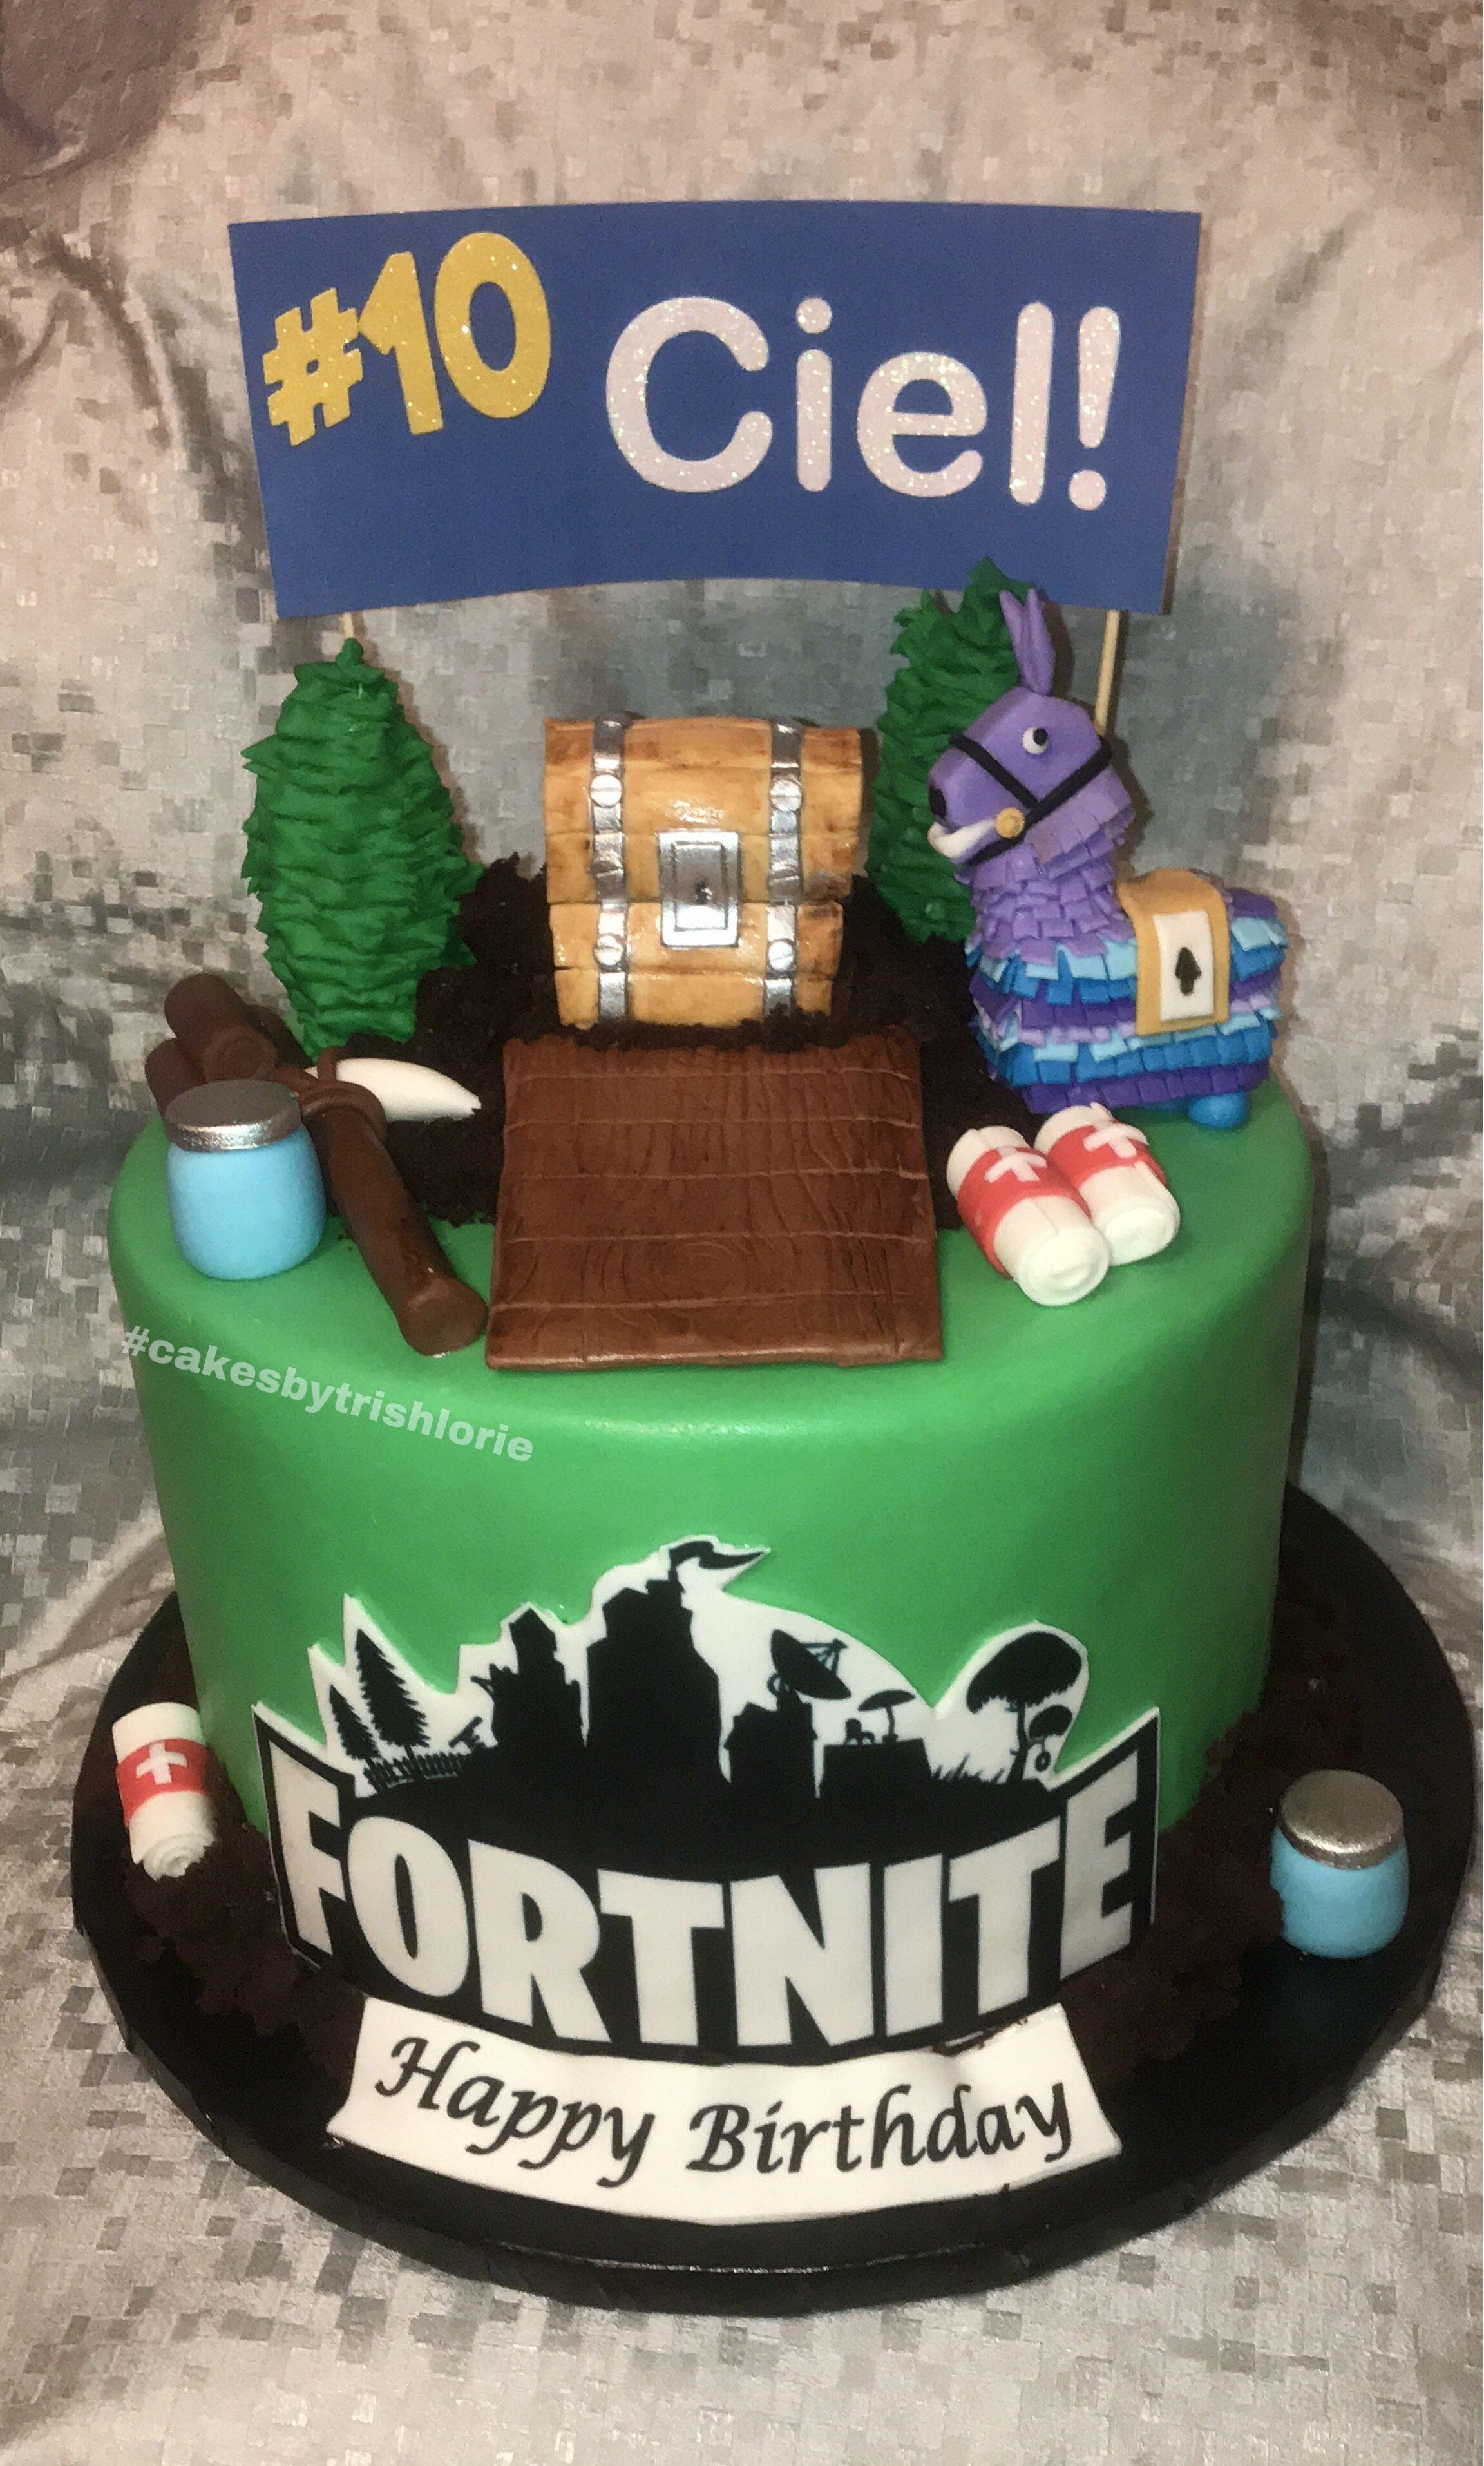 Fortnite cake llama cake themed cakes cake boss cake